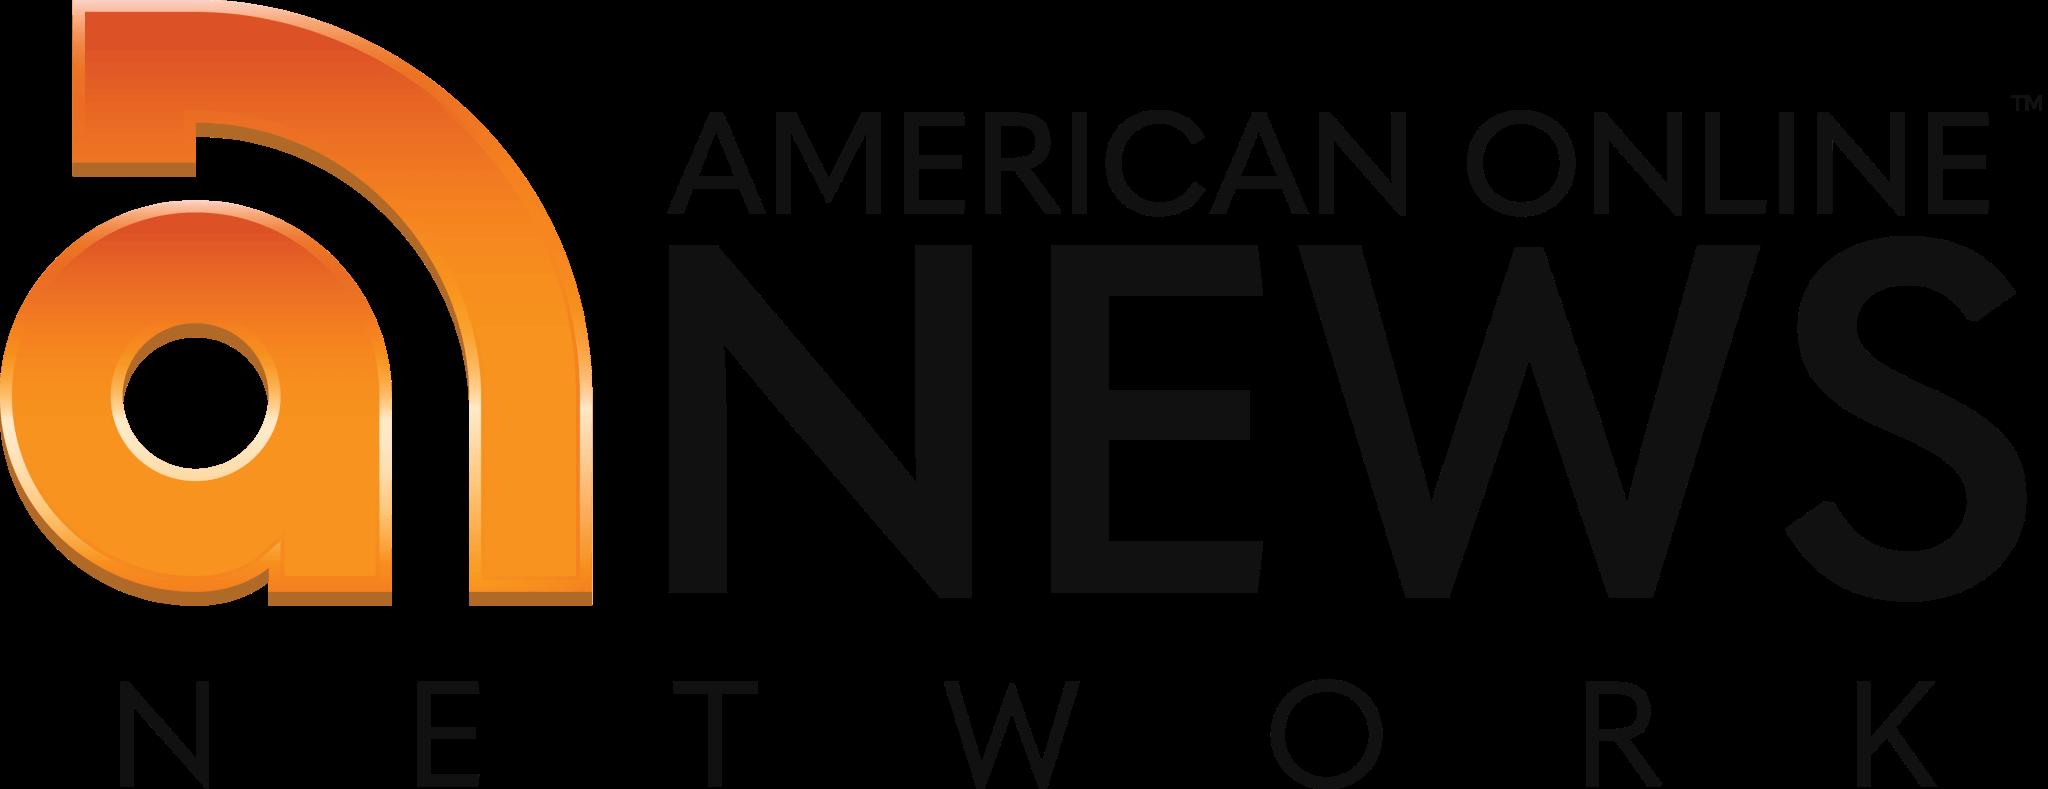 American Online News Network